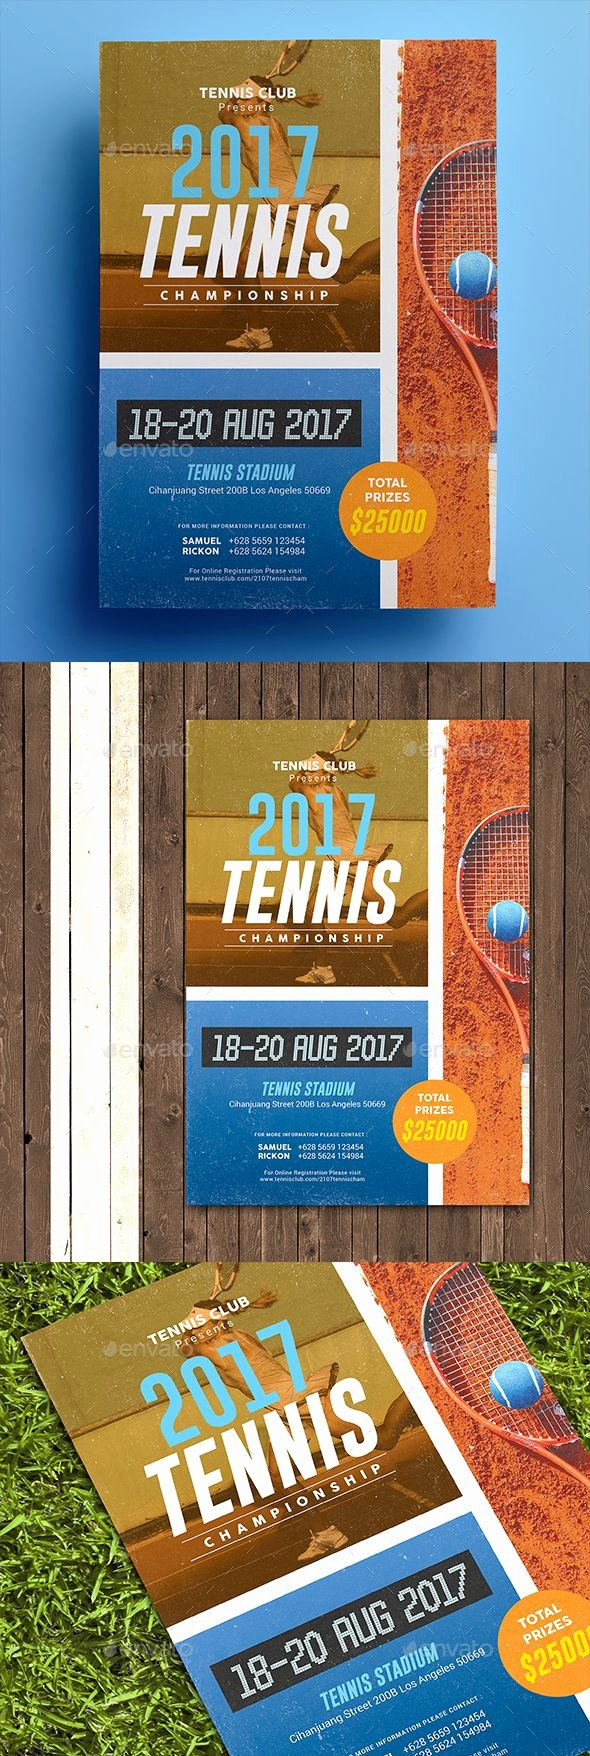 Tennis Flyer Template Free Fresh 25 Best event Flyers Ideas On Pinterest